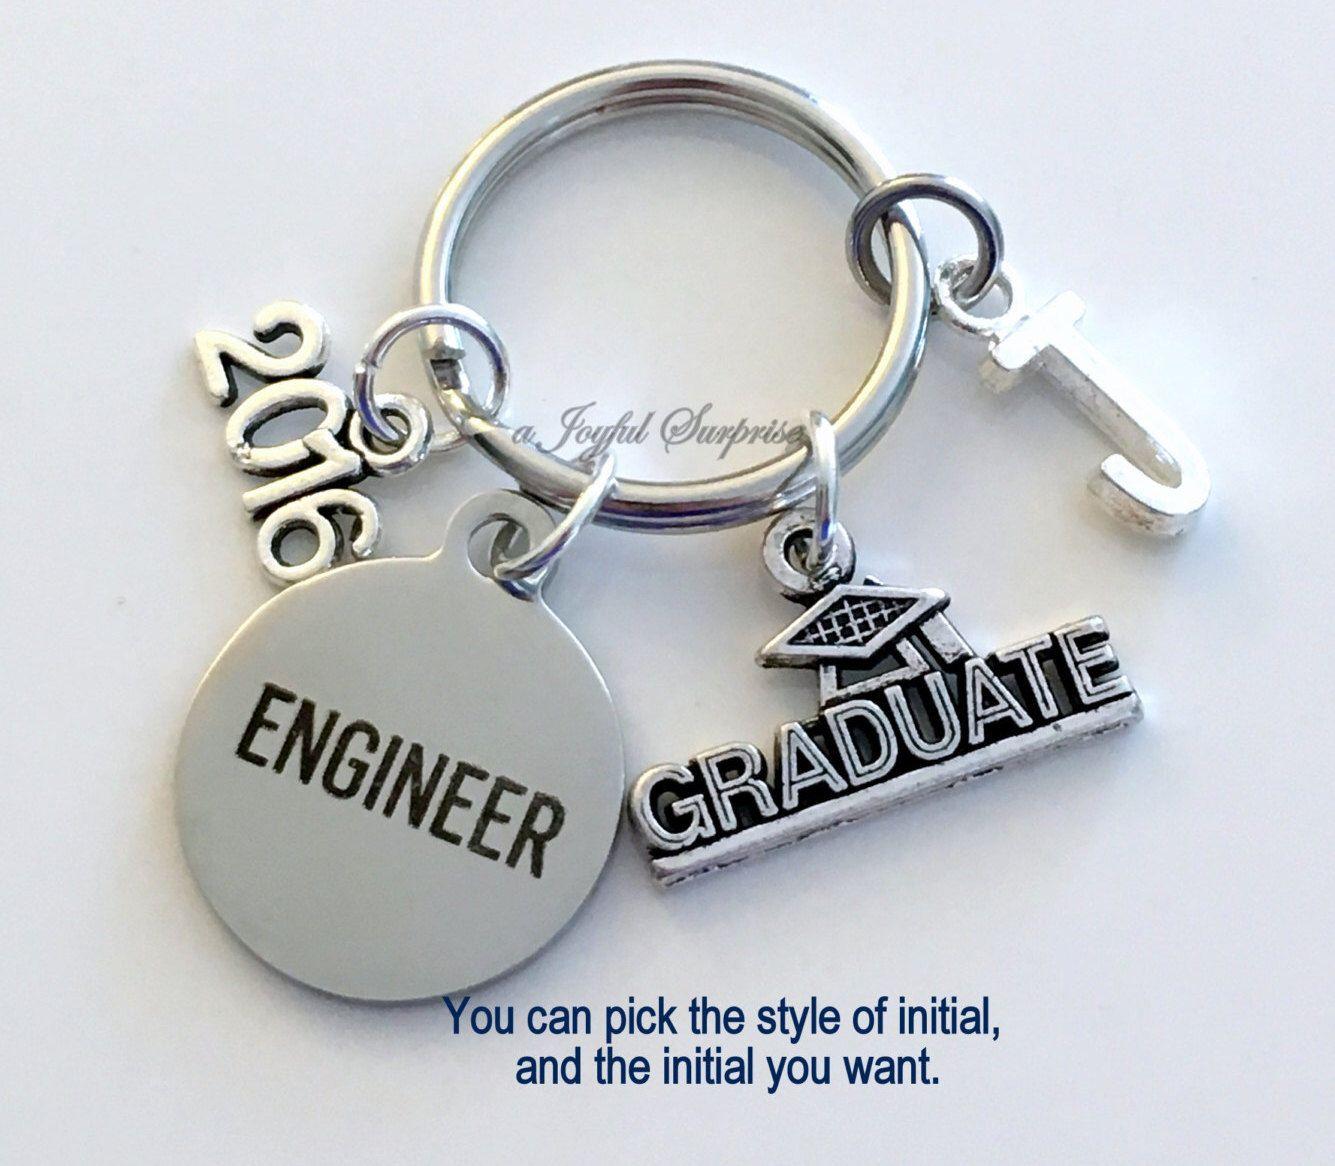 Engineer graduation gift engineering keychain for